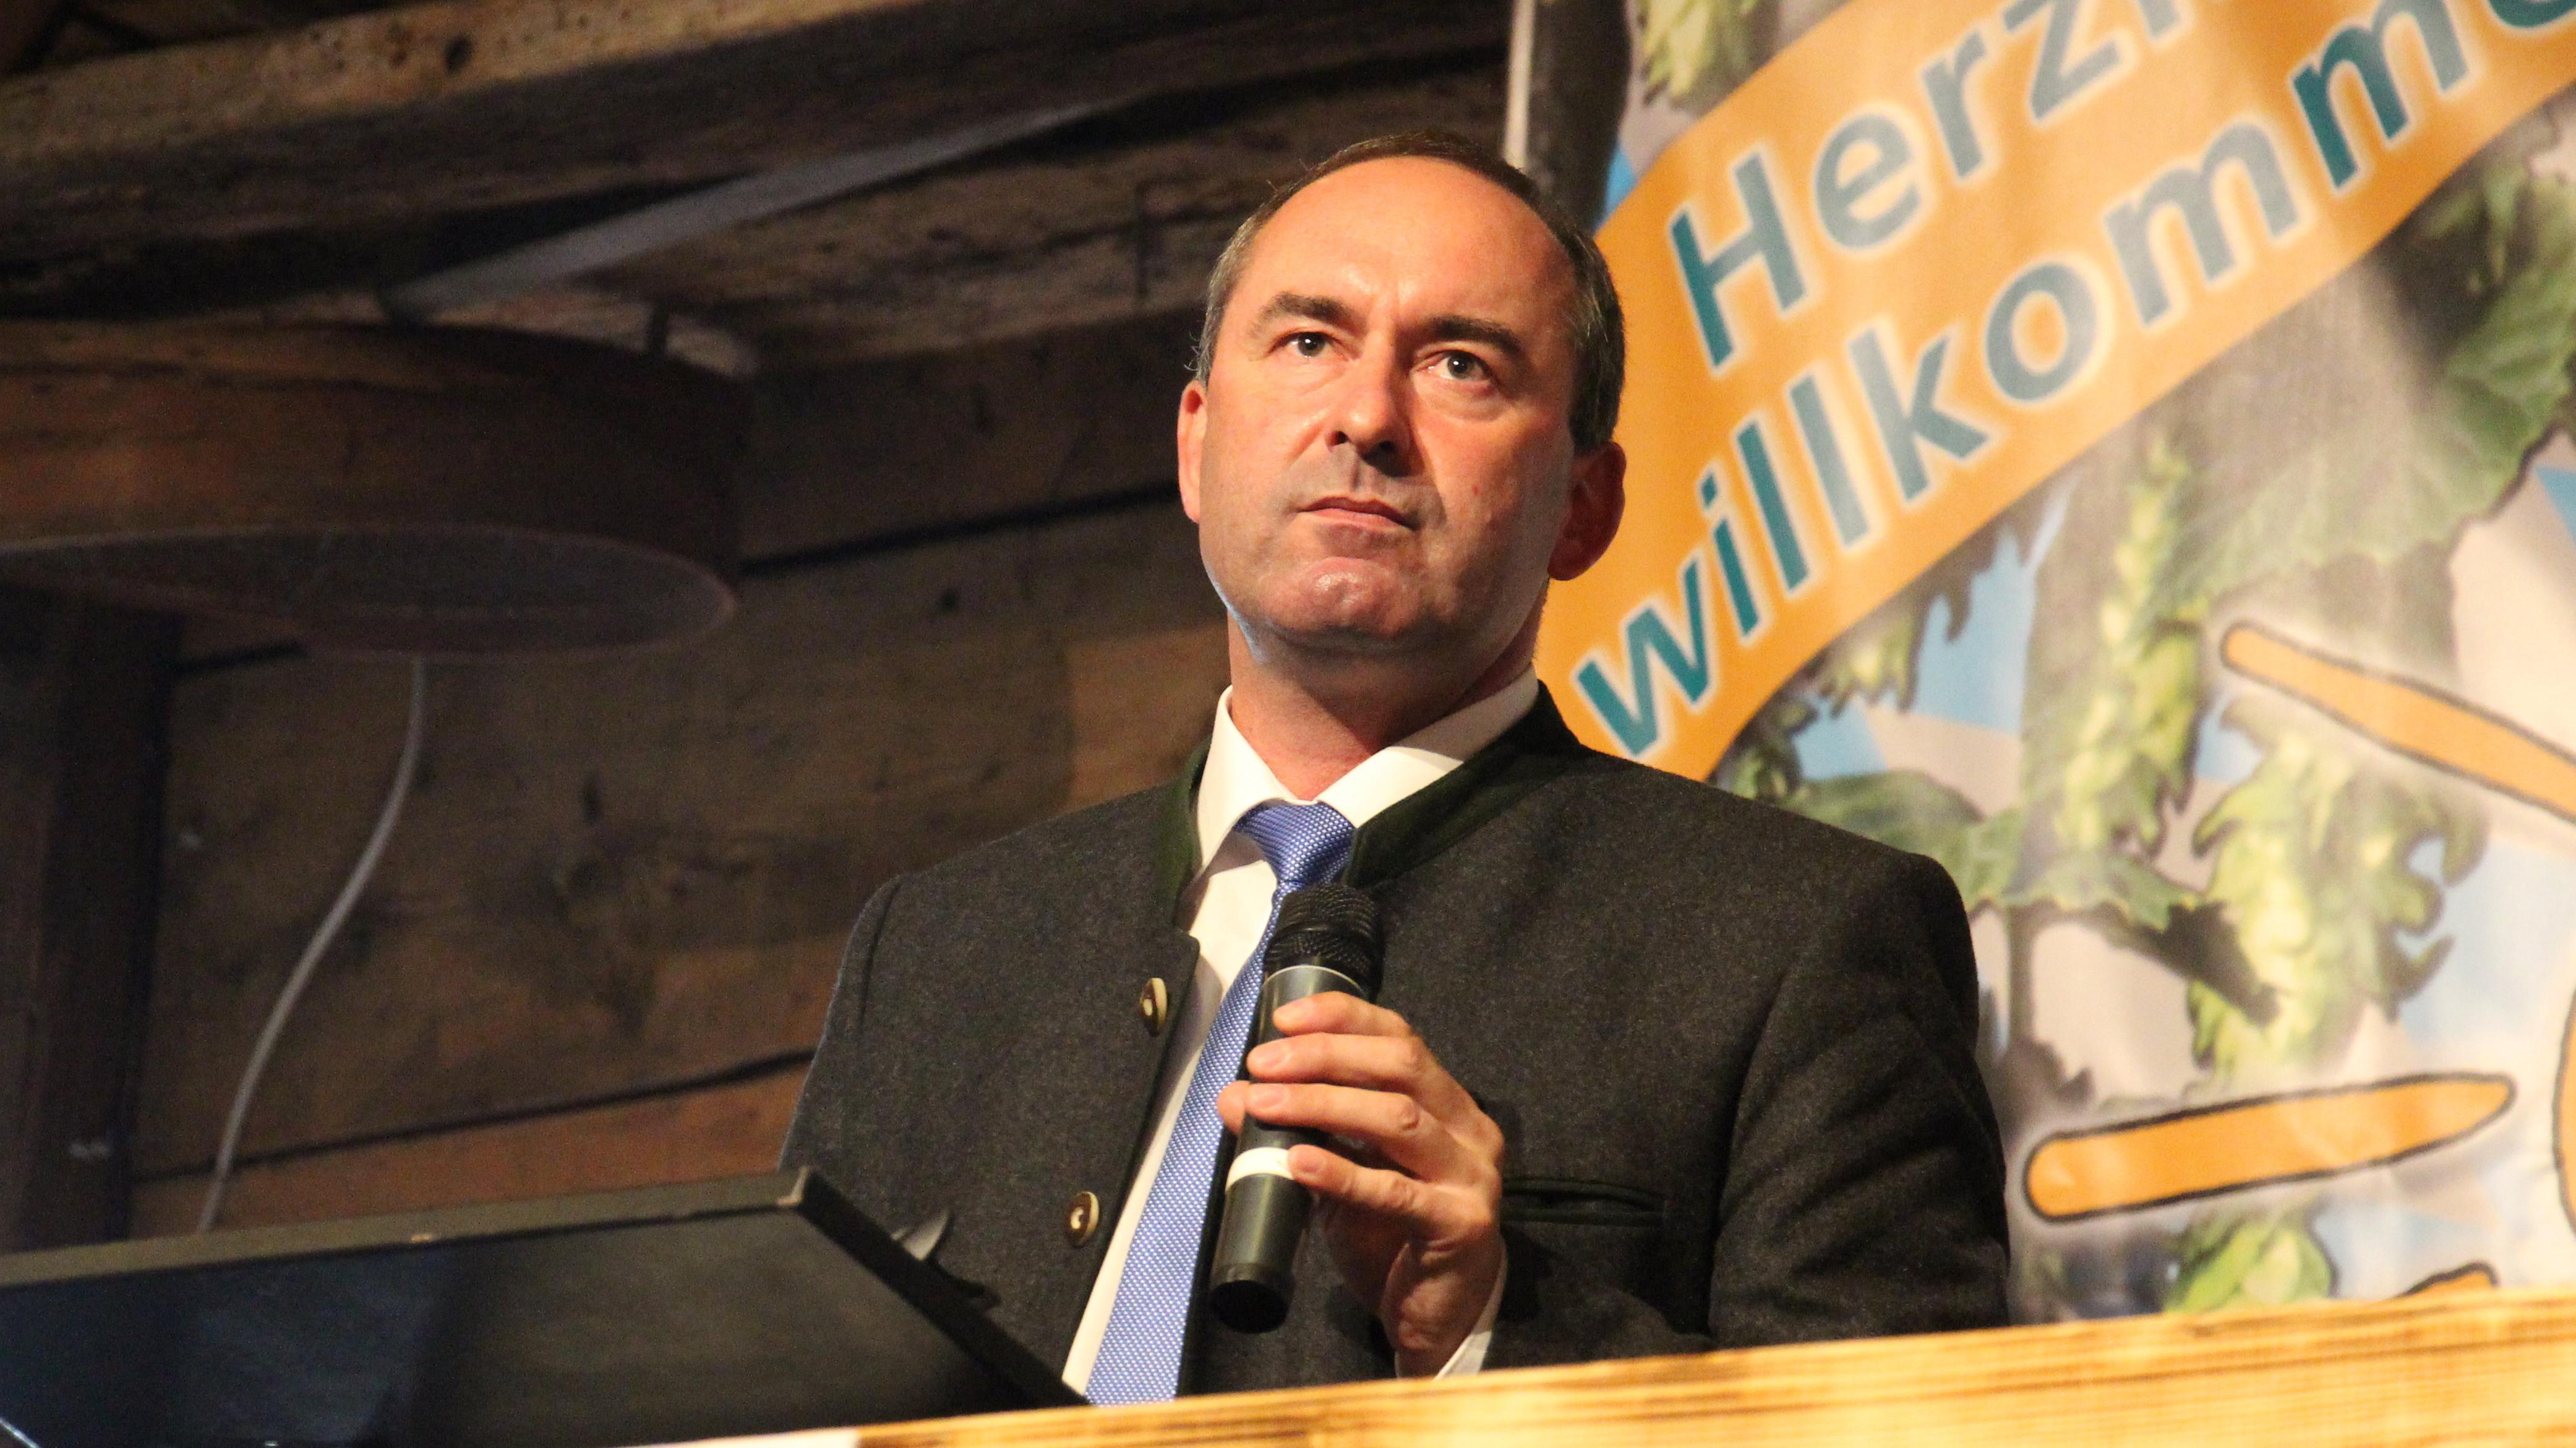 Rede Hubert Aiwanger beim Gillamoos